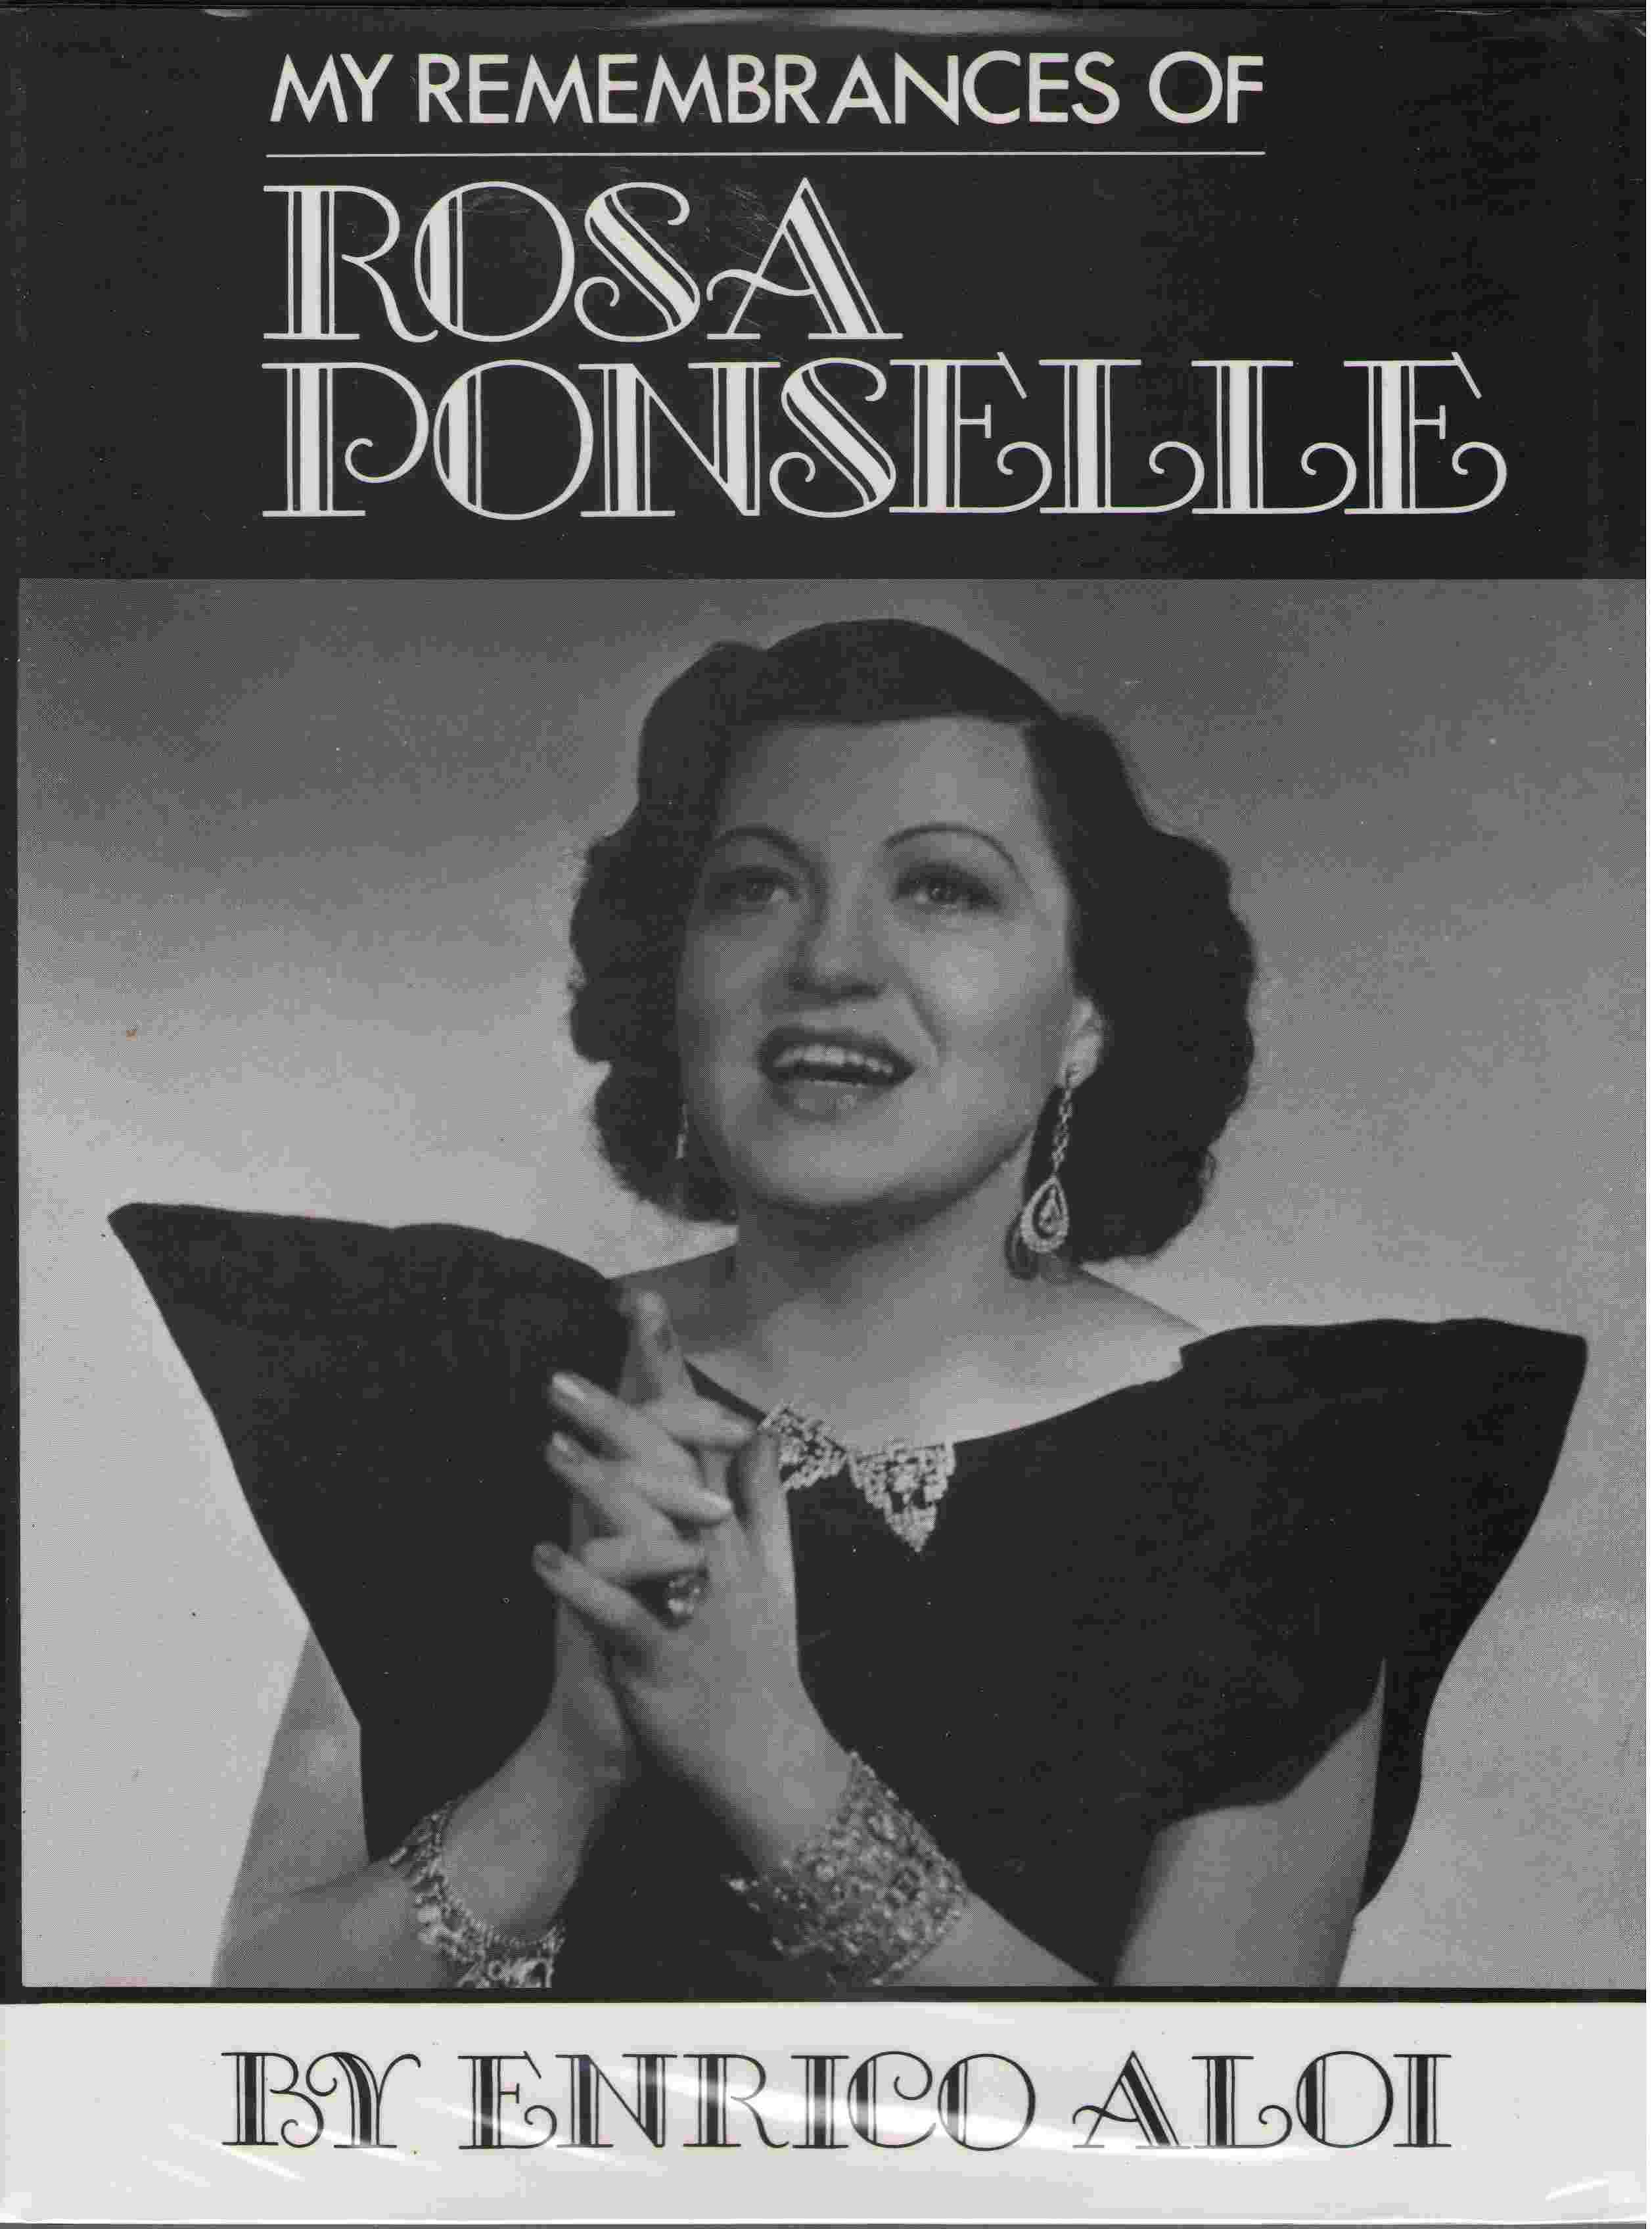 My Remembrances of Rosa Ponselle, Aloi, Enrico